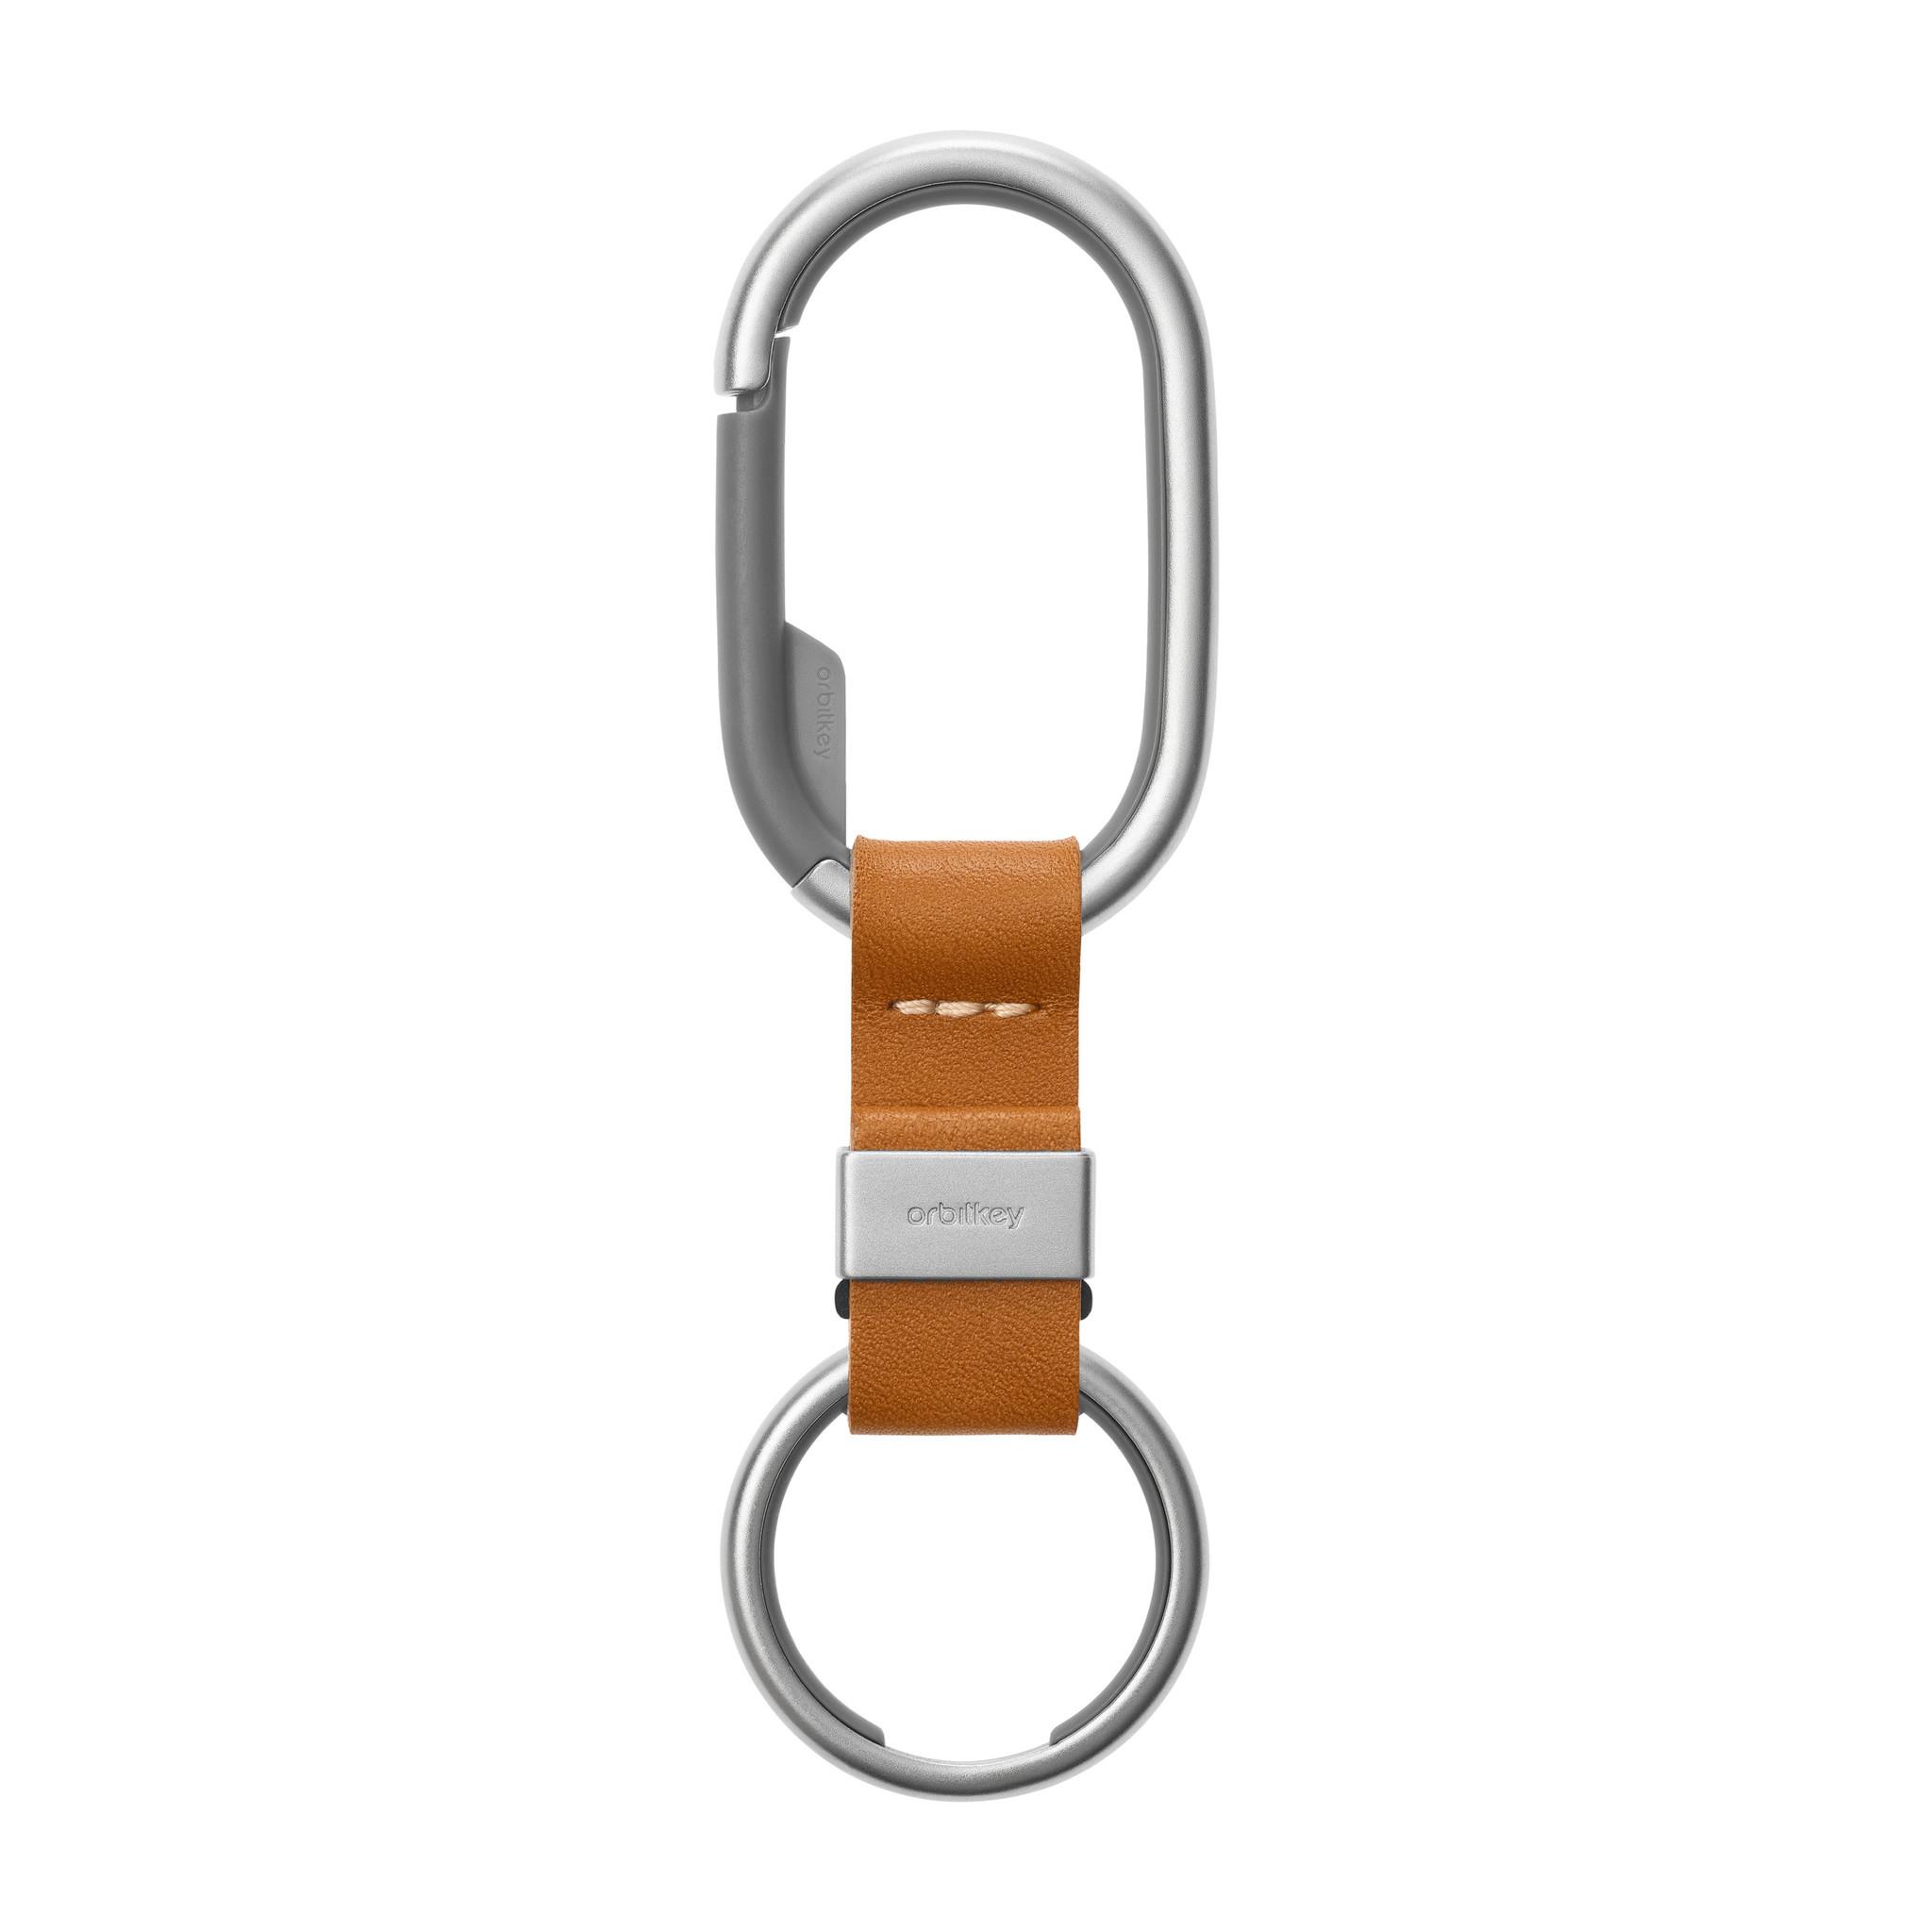 Orbitkey Accessoires Orbitkey Clip Tan / White Stitching